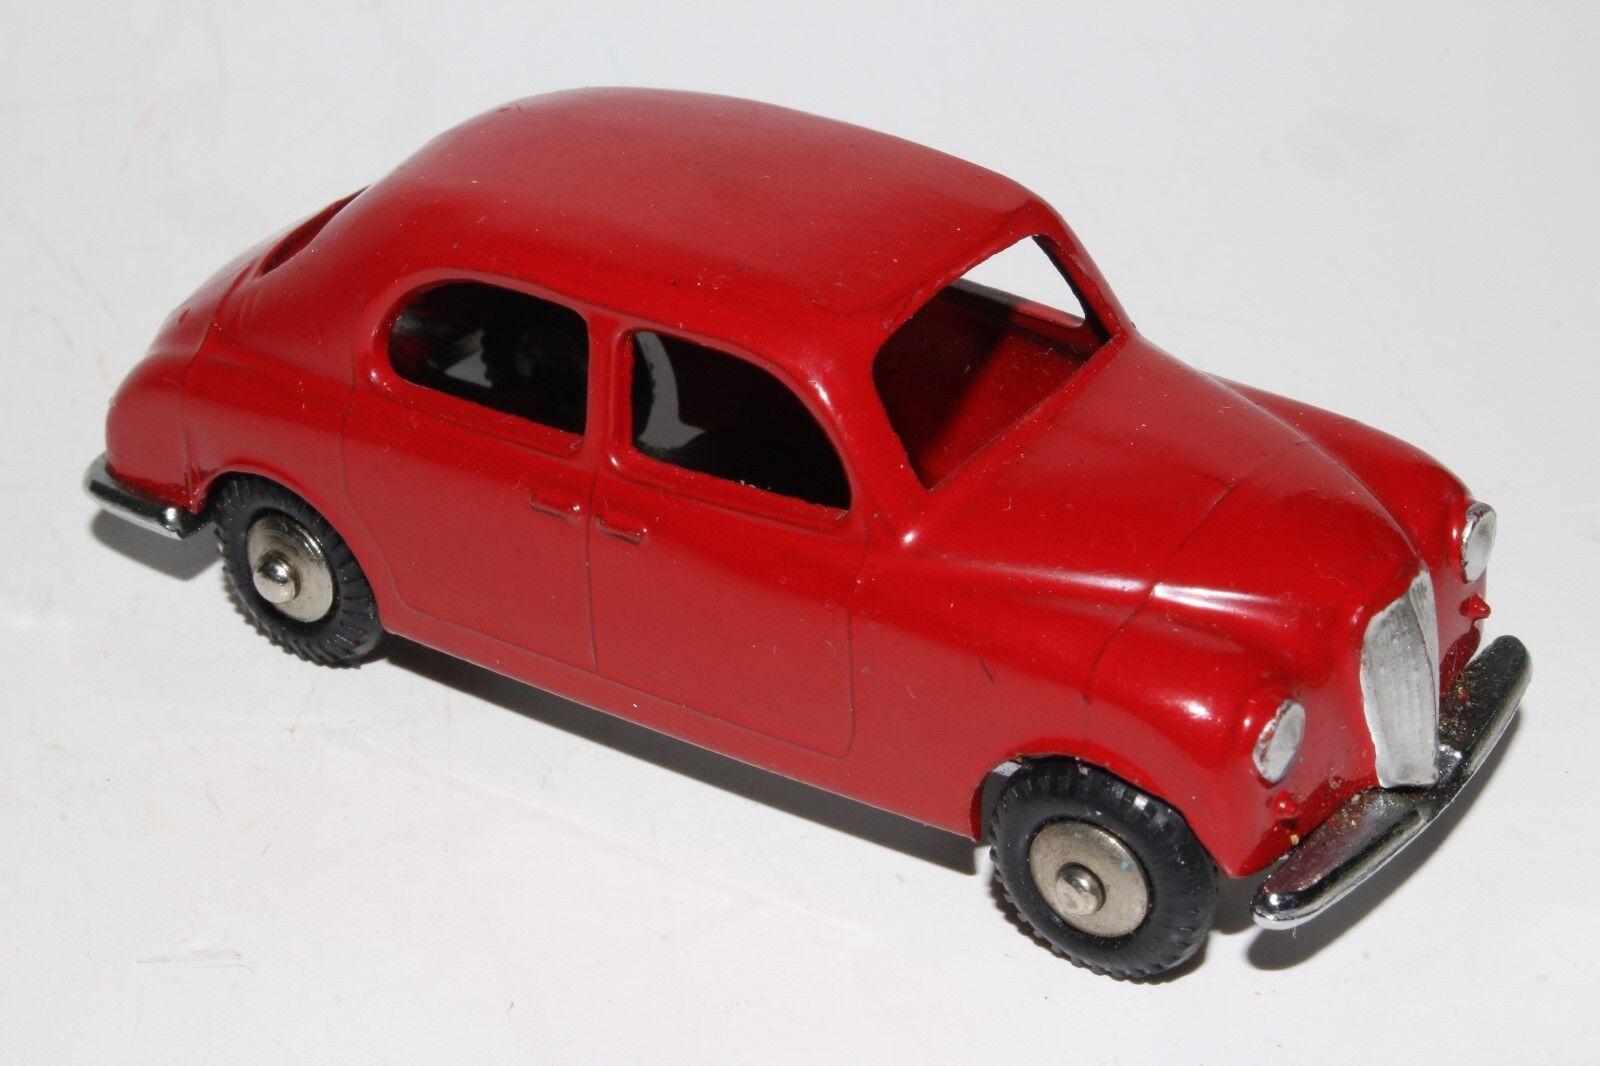 Mercurio, década de 1950 Lancia Appia Sedan, Original